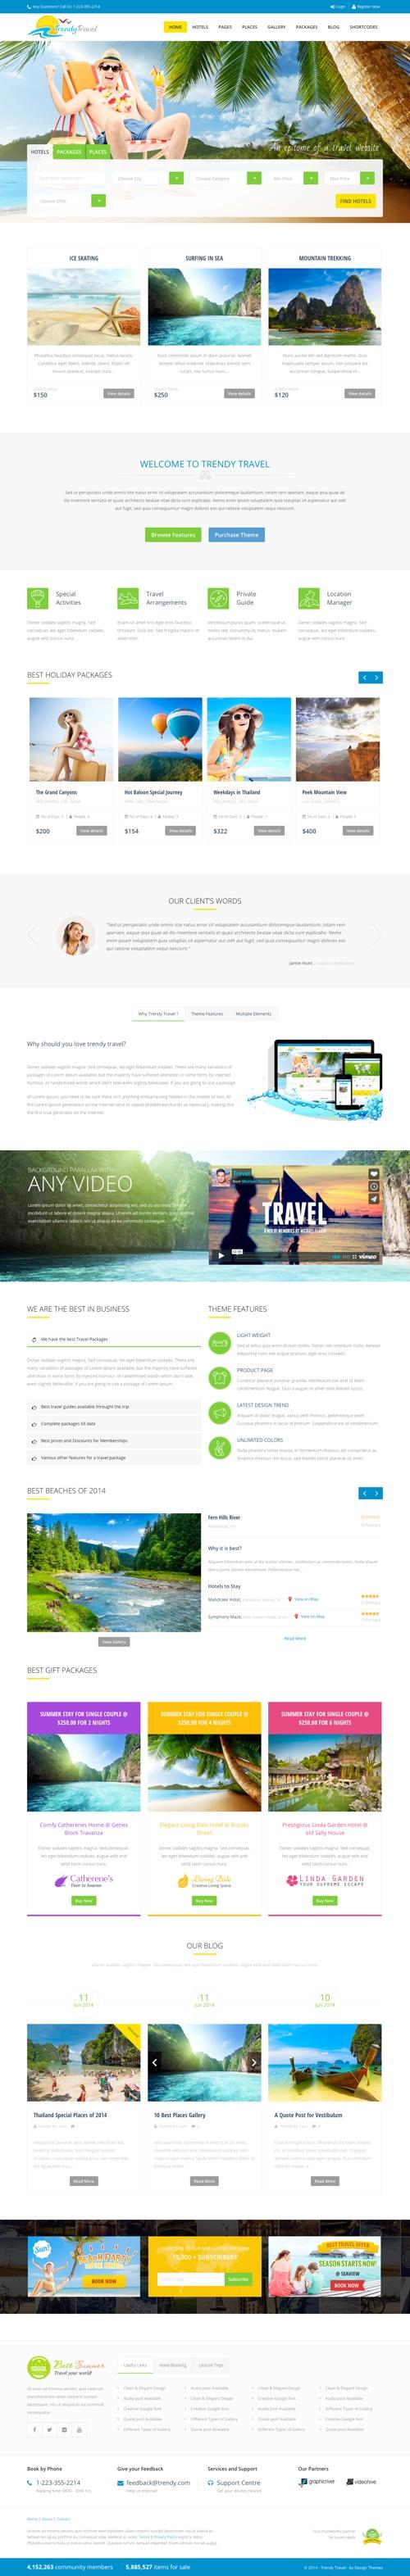 10+ Best Tour & Travel Agency WordPress Themes 2019